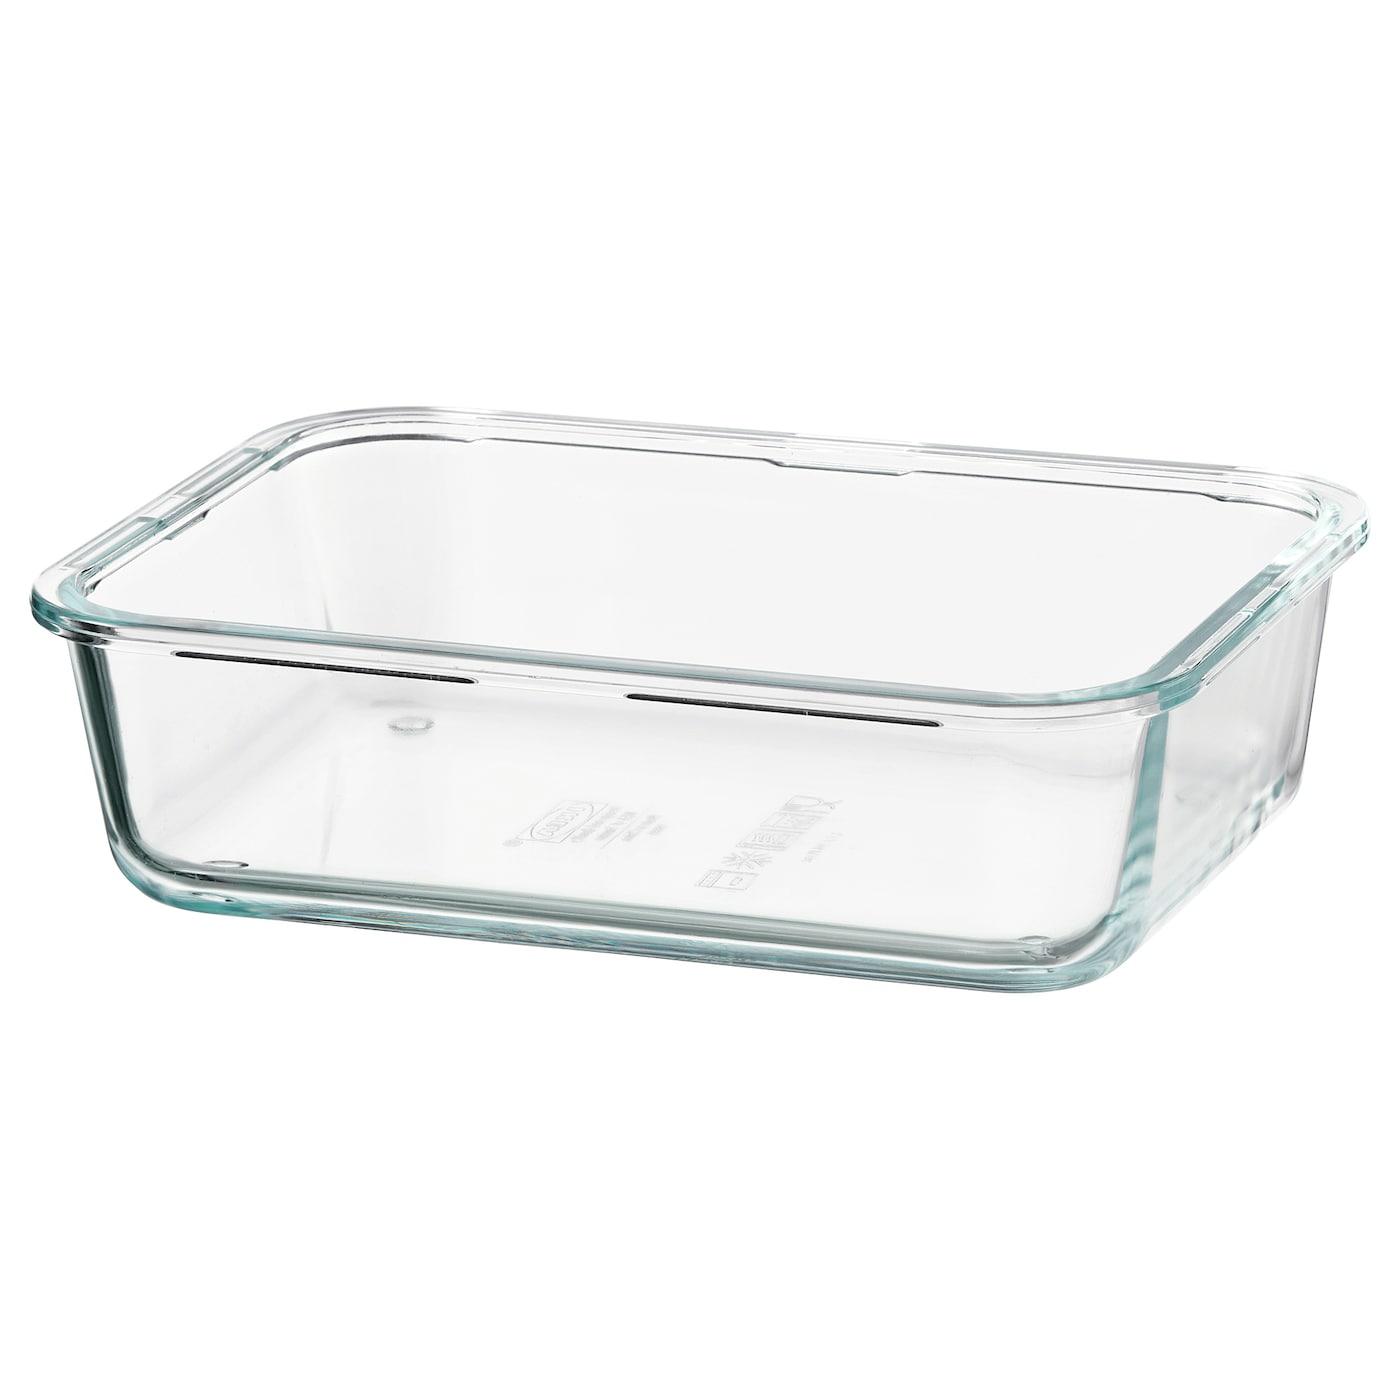 Cook & Heat Rectangular glass food